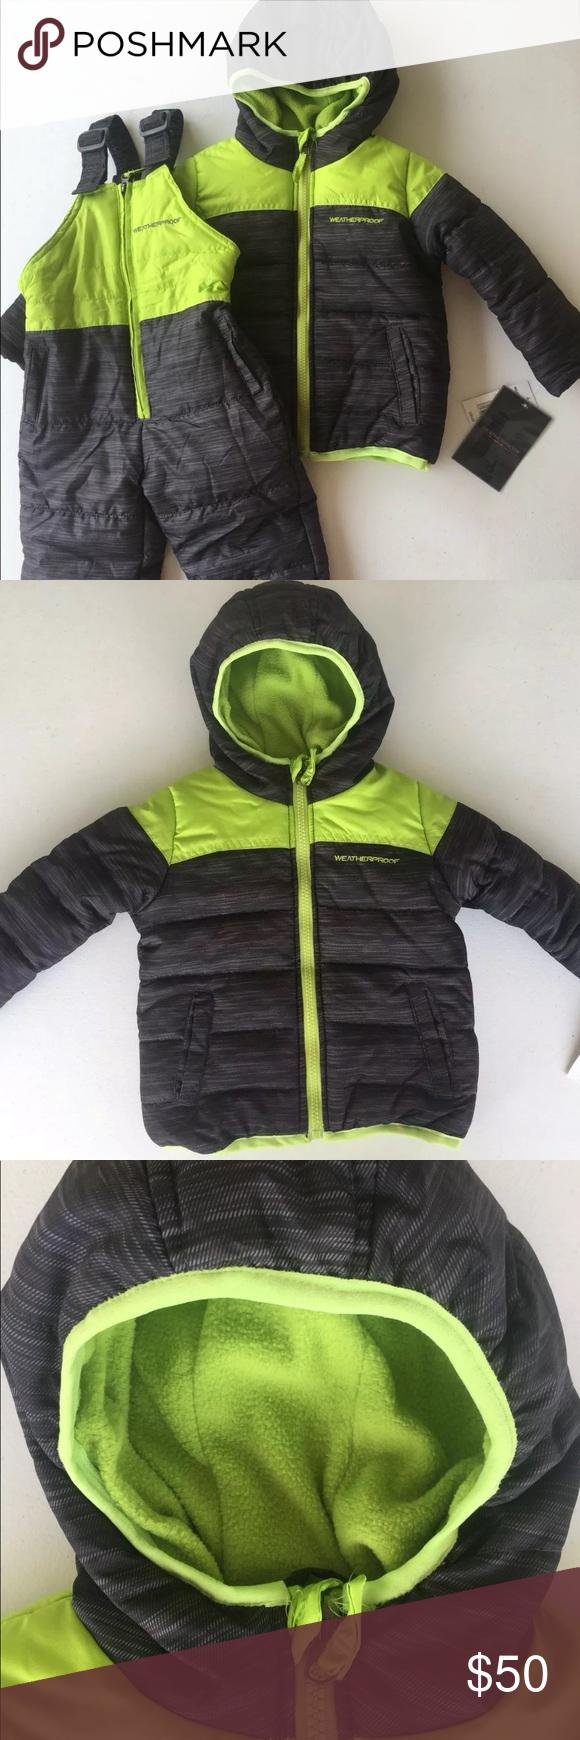 New Weatherproof Boys 18m Winter Jacket Coat Pants Winter Coats Jackets Clothes Design Winter Jackets [ 1740 x 580 Pixel ]